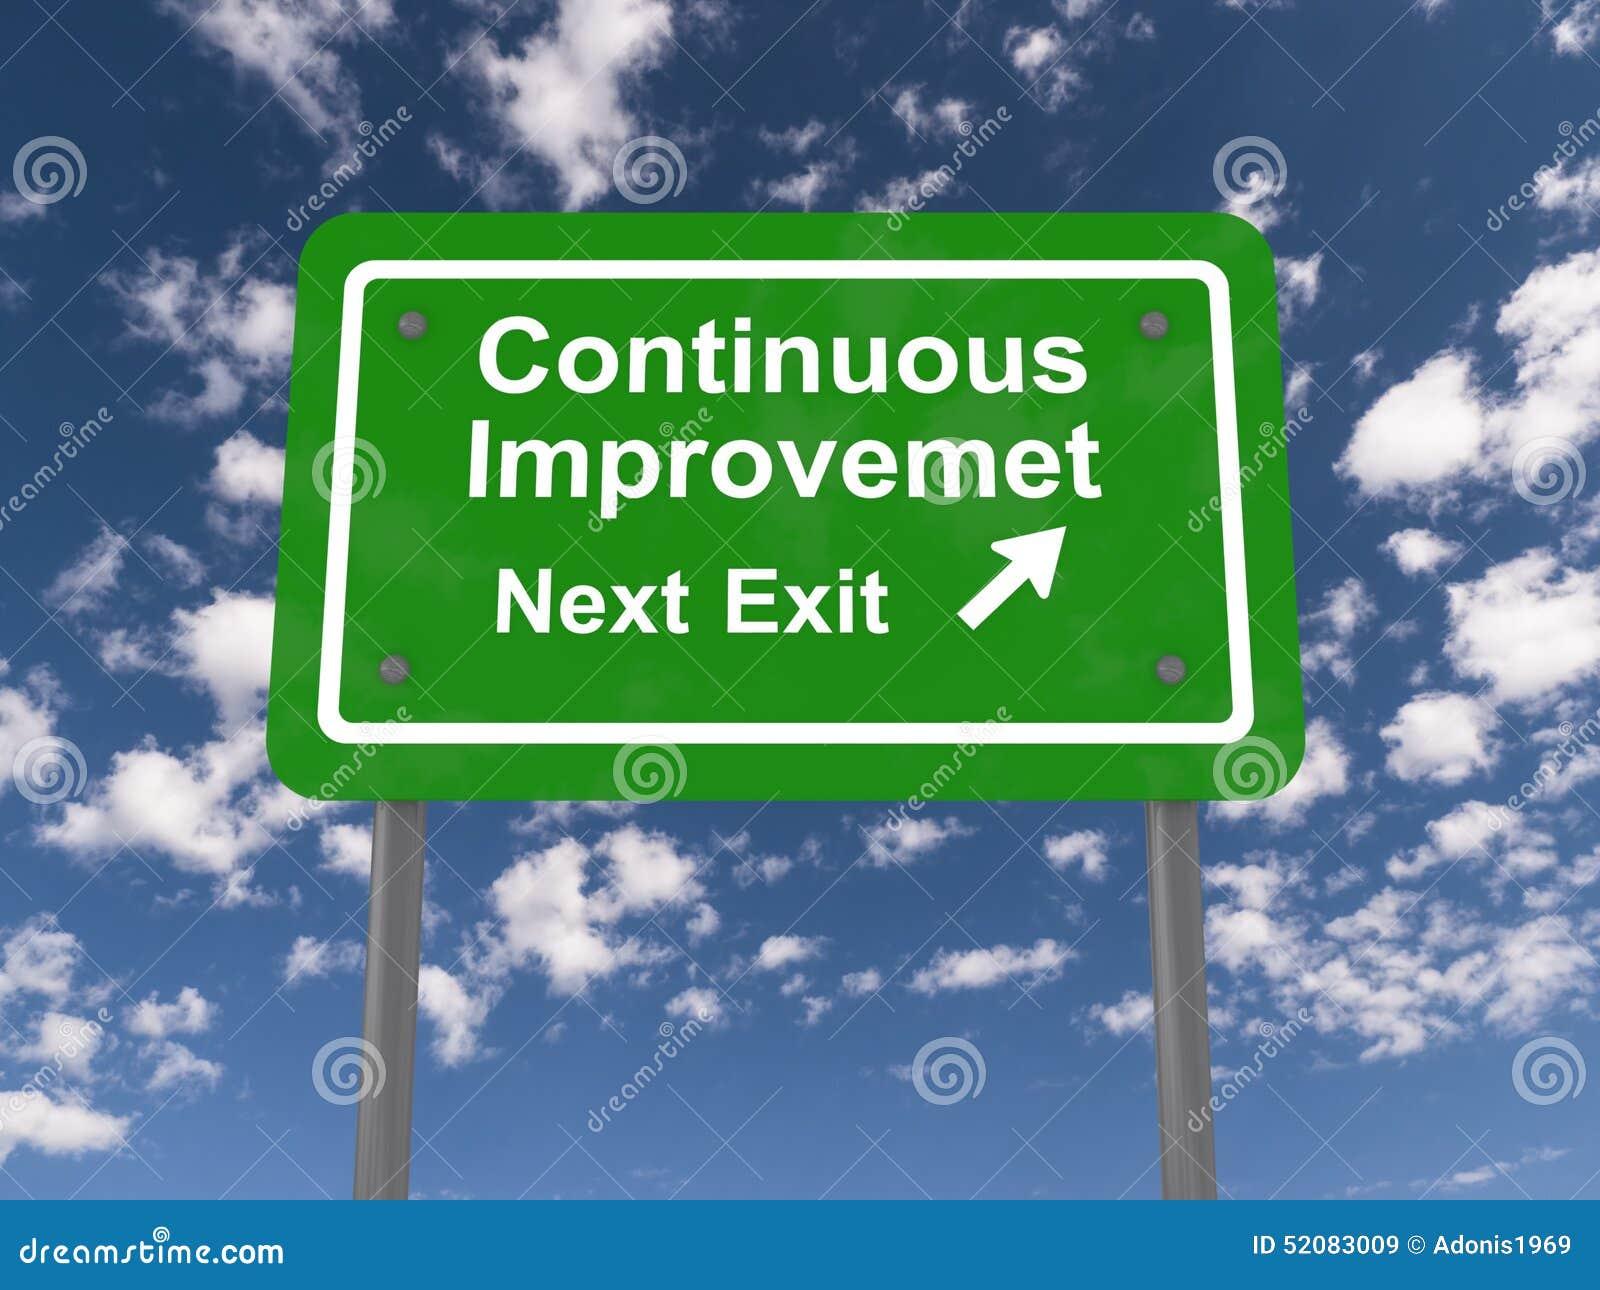 Continuous Improvement Next Exit Stock Photo Image